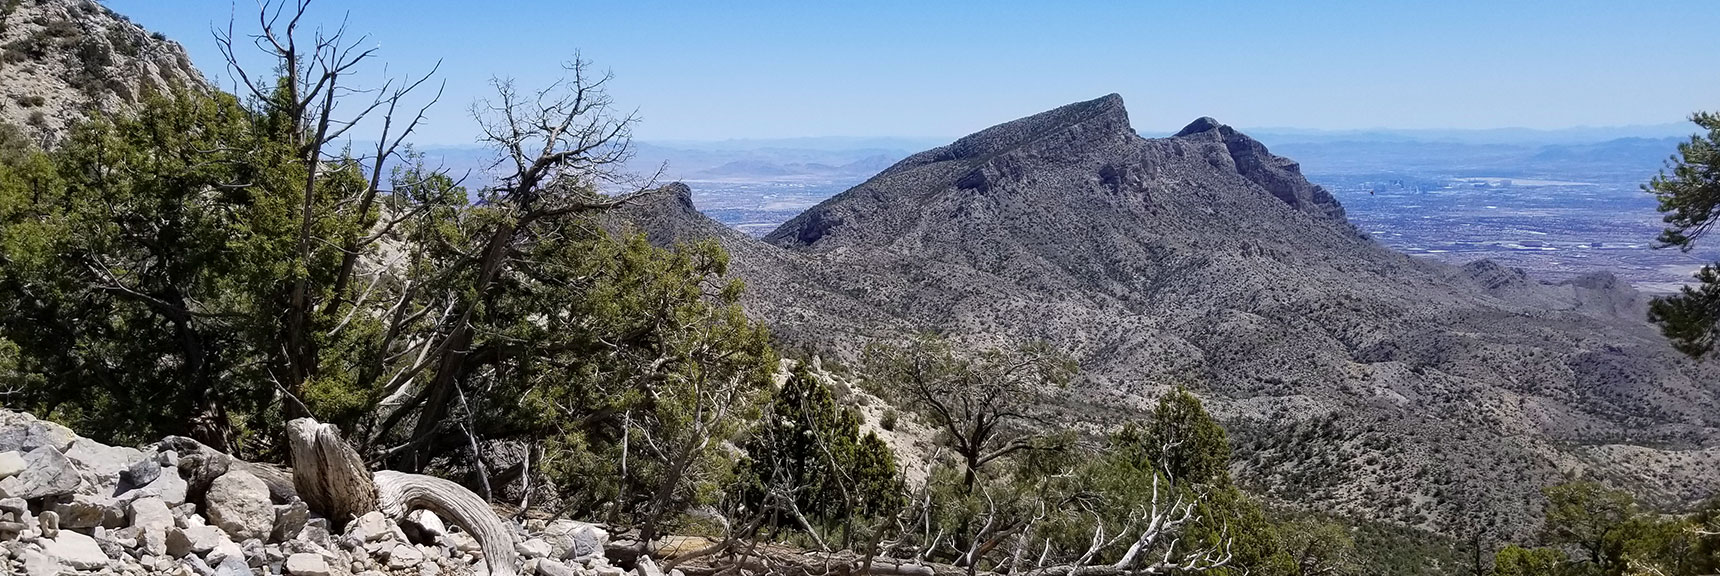 Crescent shaped mountain in Calico Basin area